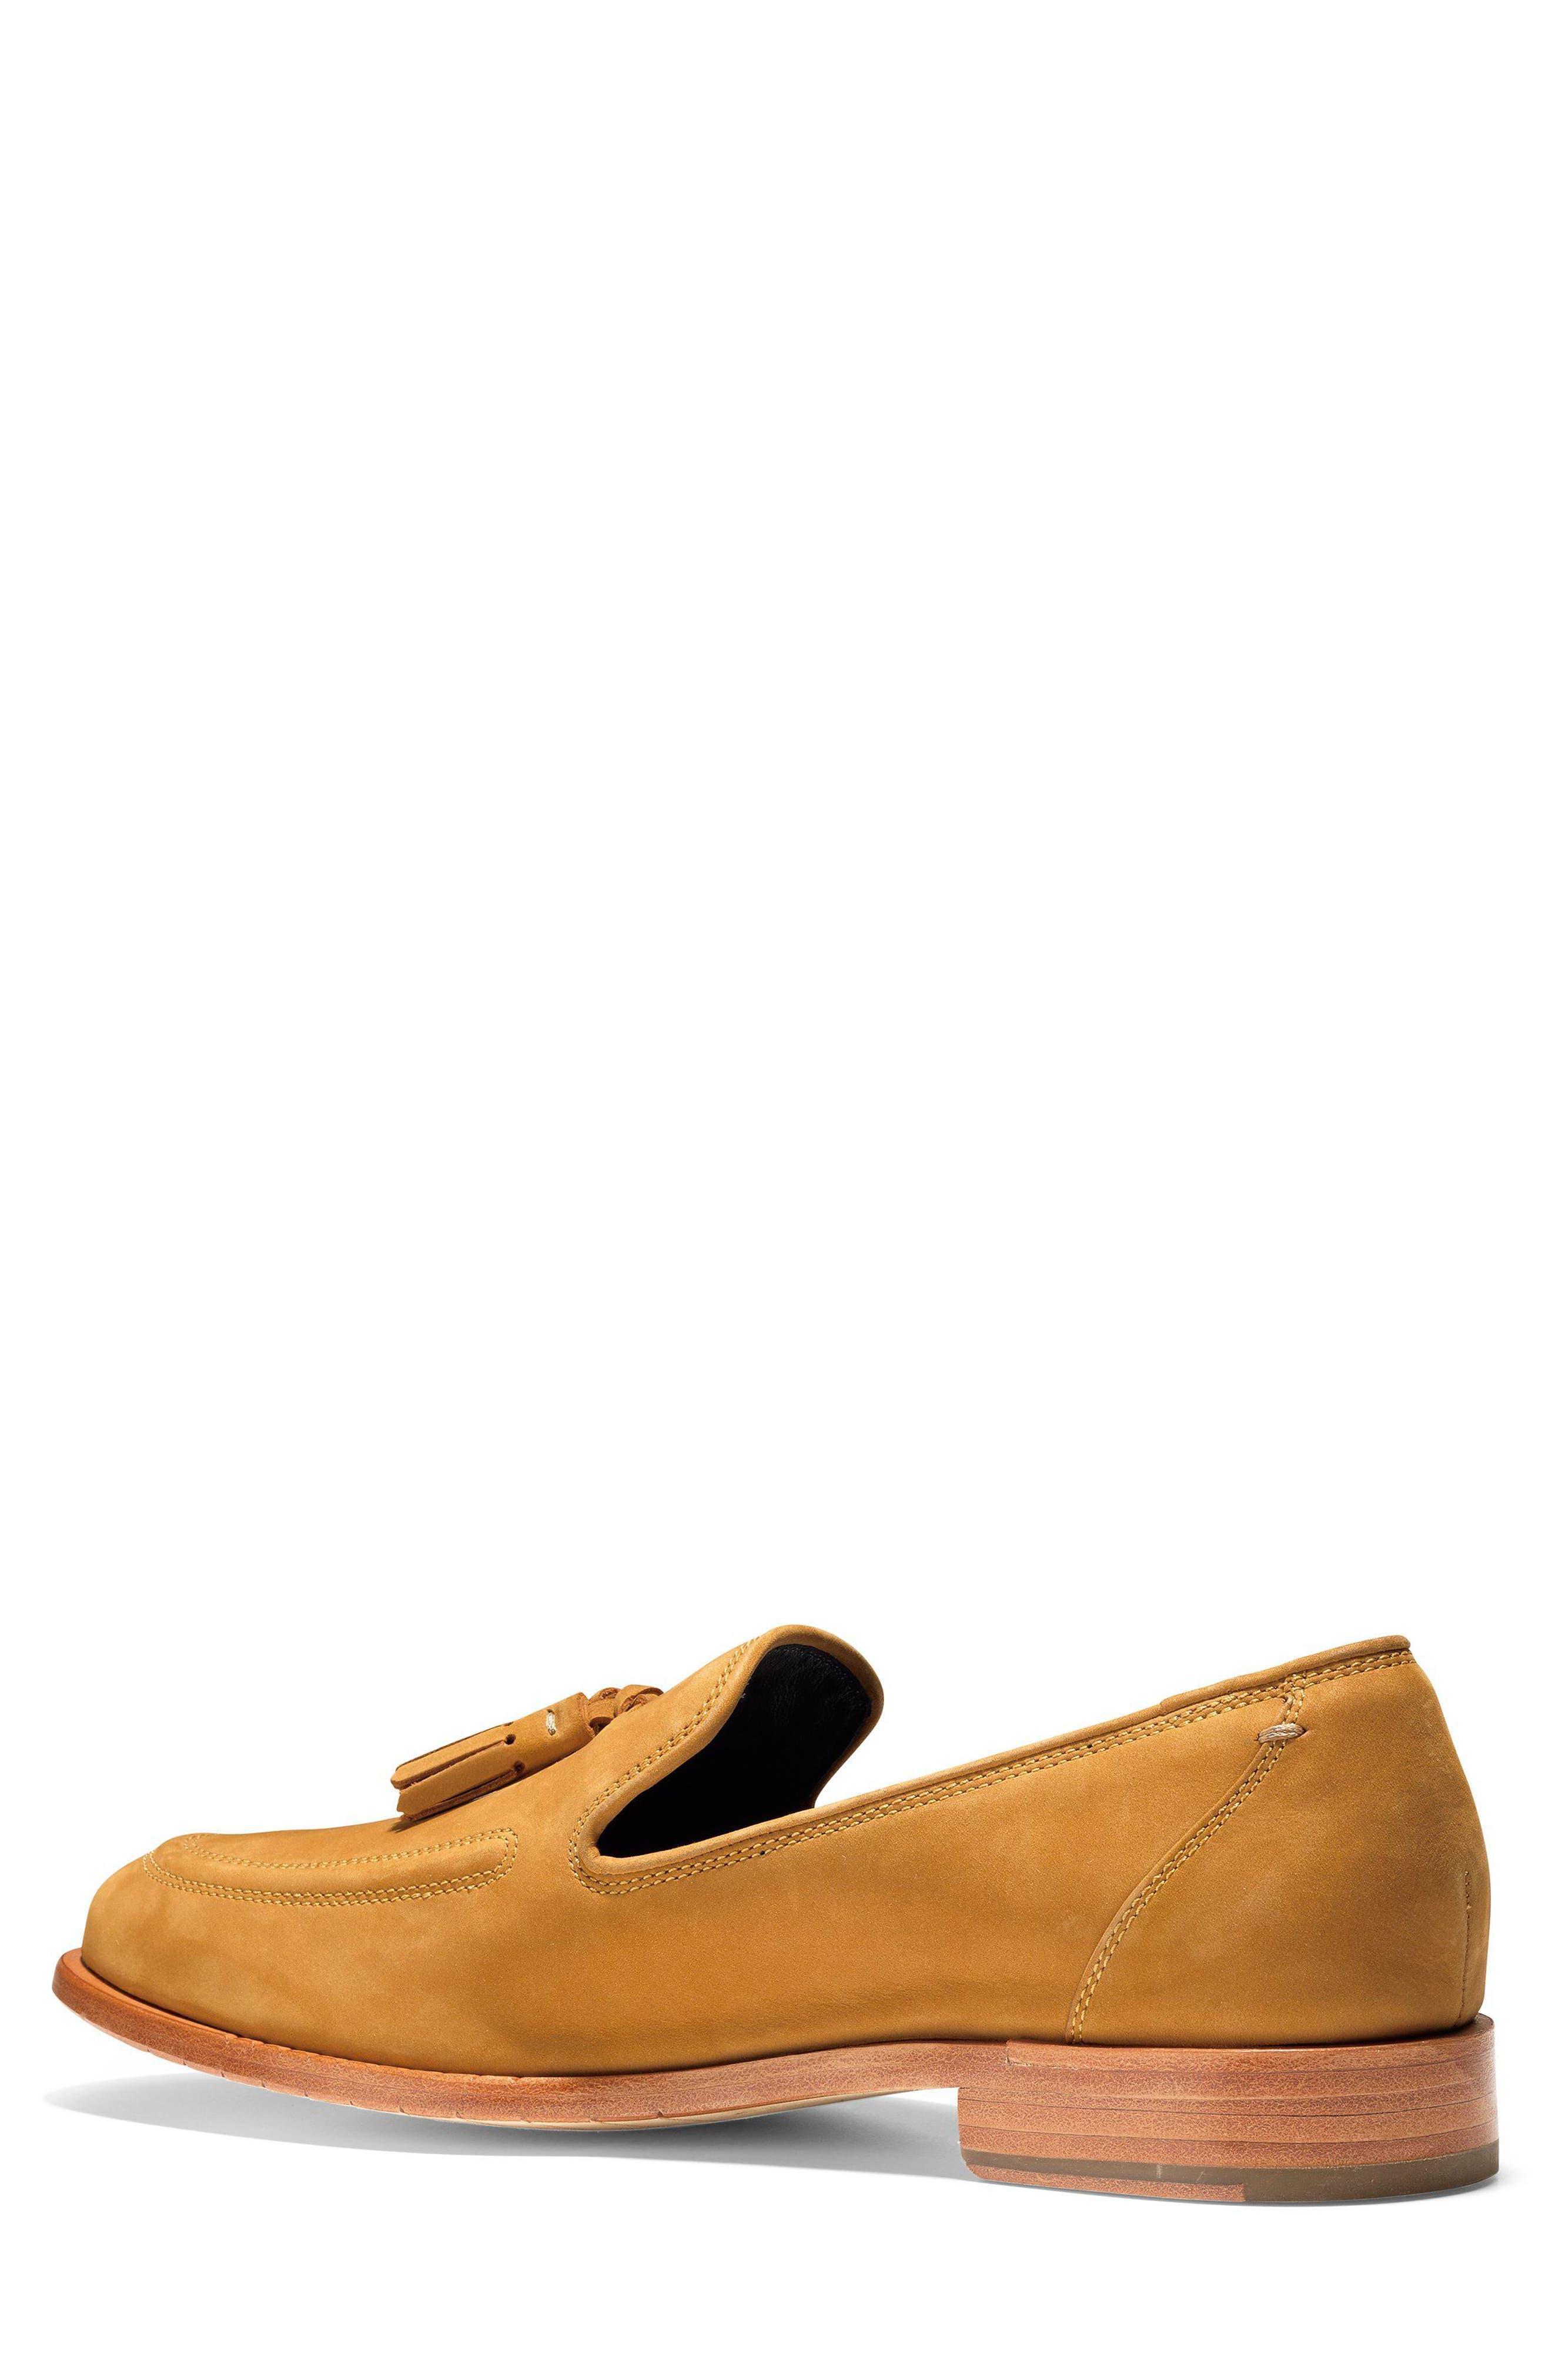 Washington Grand Tassel Loafer,                             Alternate thumbnail 2, color,                             Cathay Spice Nubuck